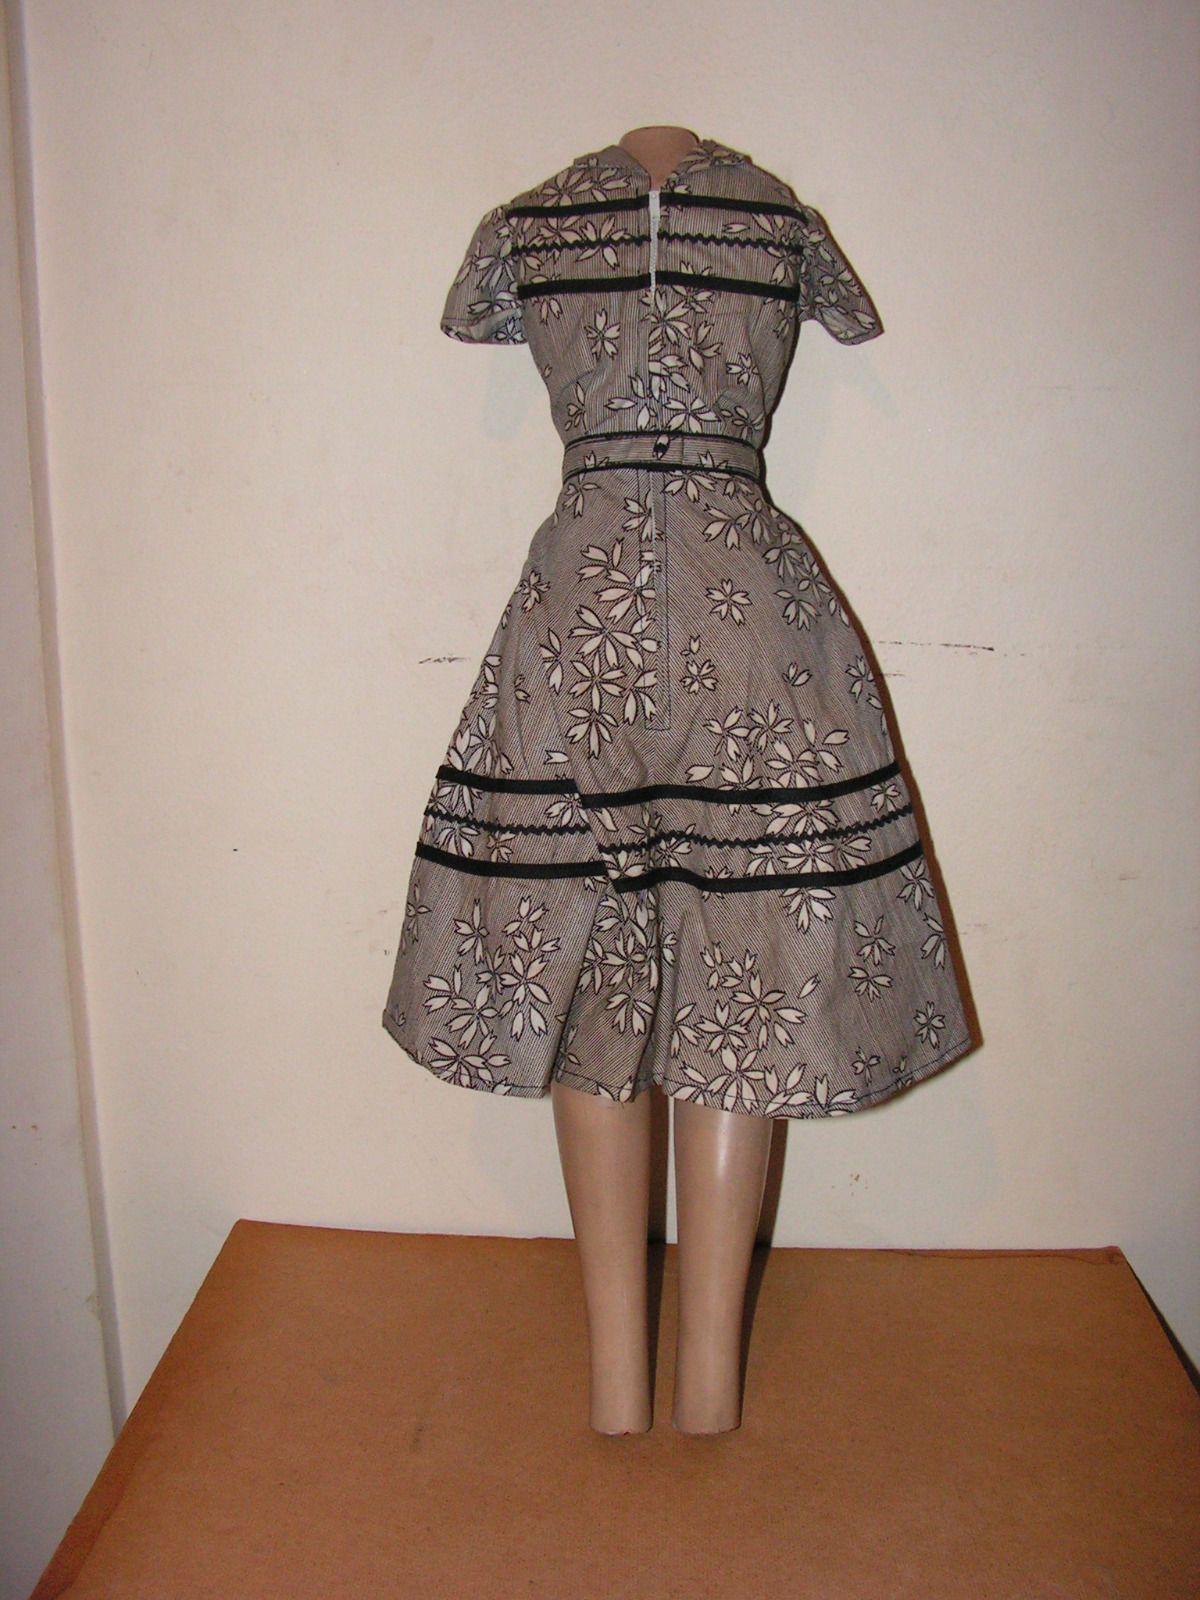 Antique Mannequin 40's Seamstress Doll Display Dress Form Princess ...